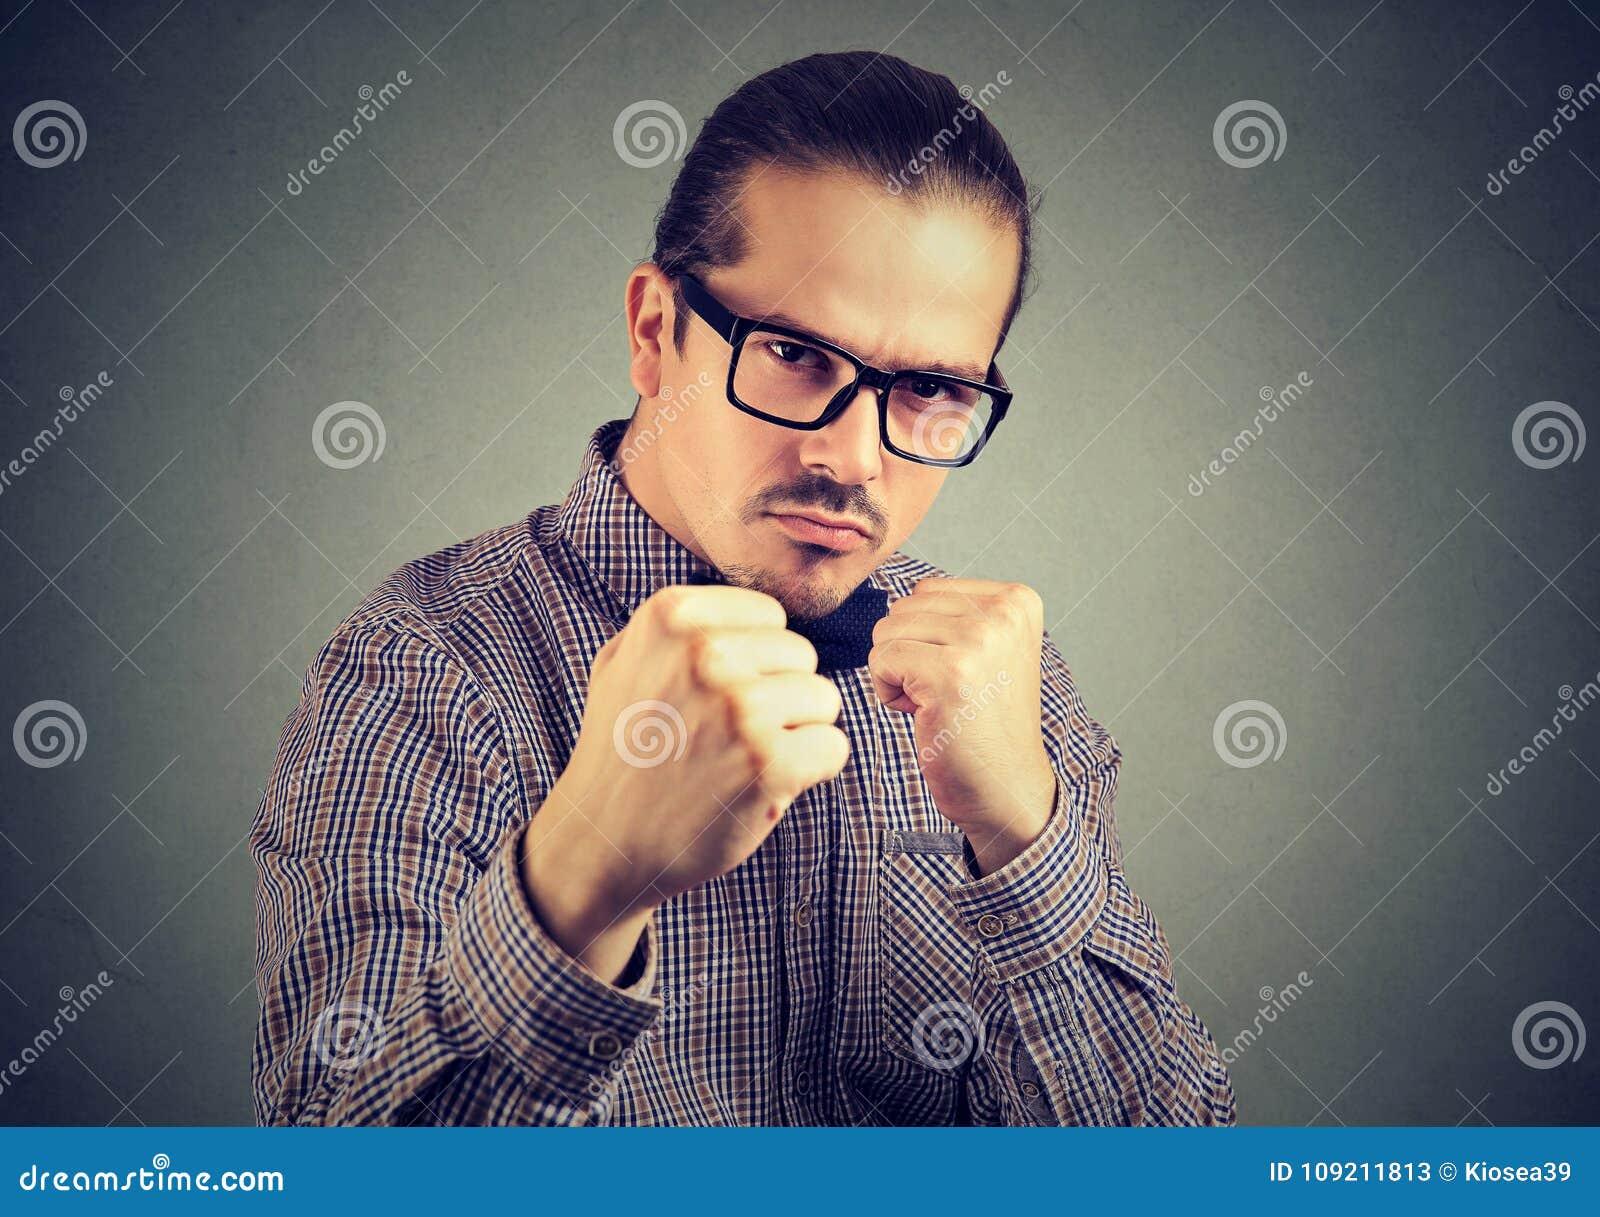 Aggressive man threatening with fist